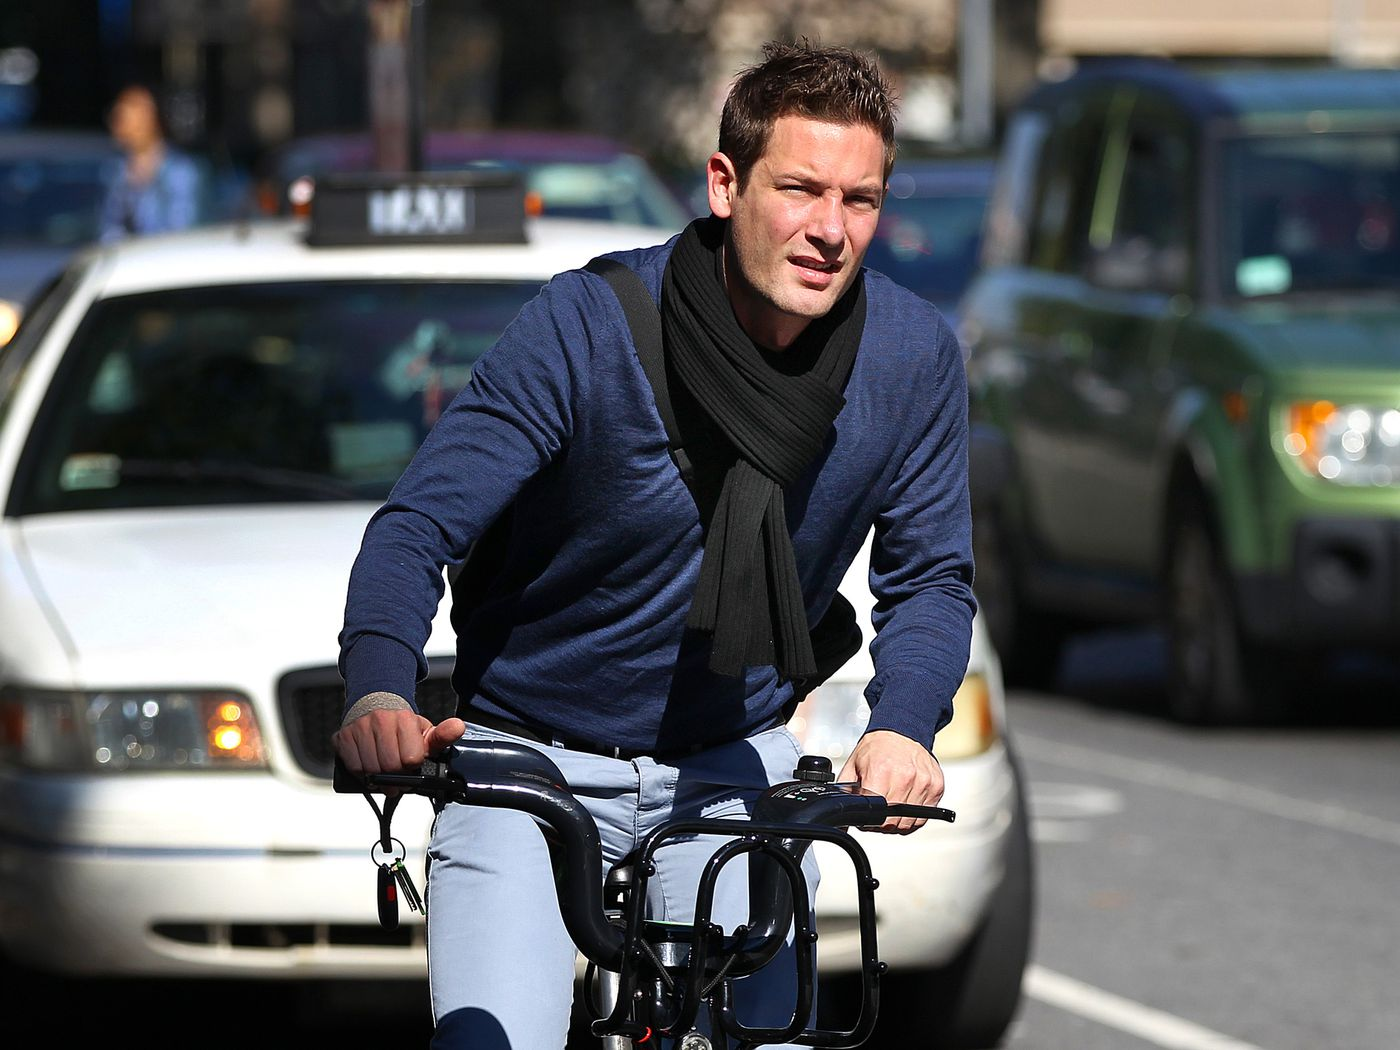 Stop forcing people to wear bike helmets - Vox